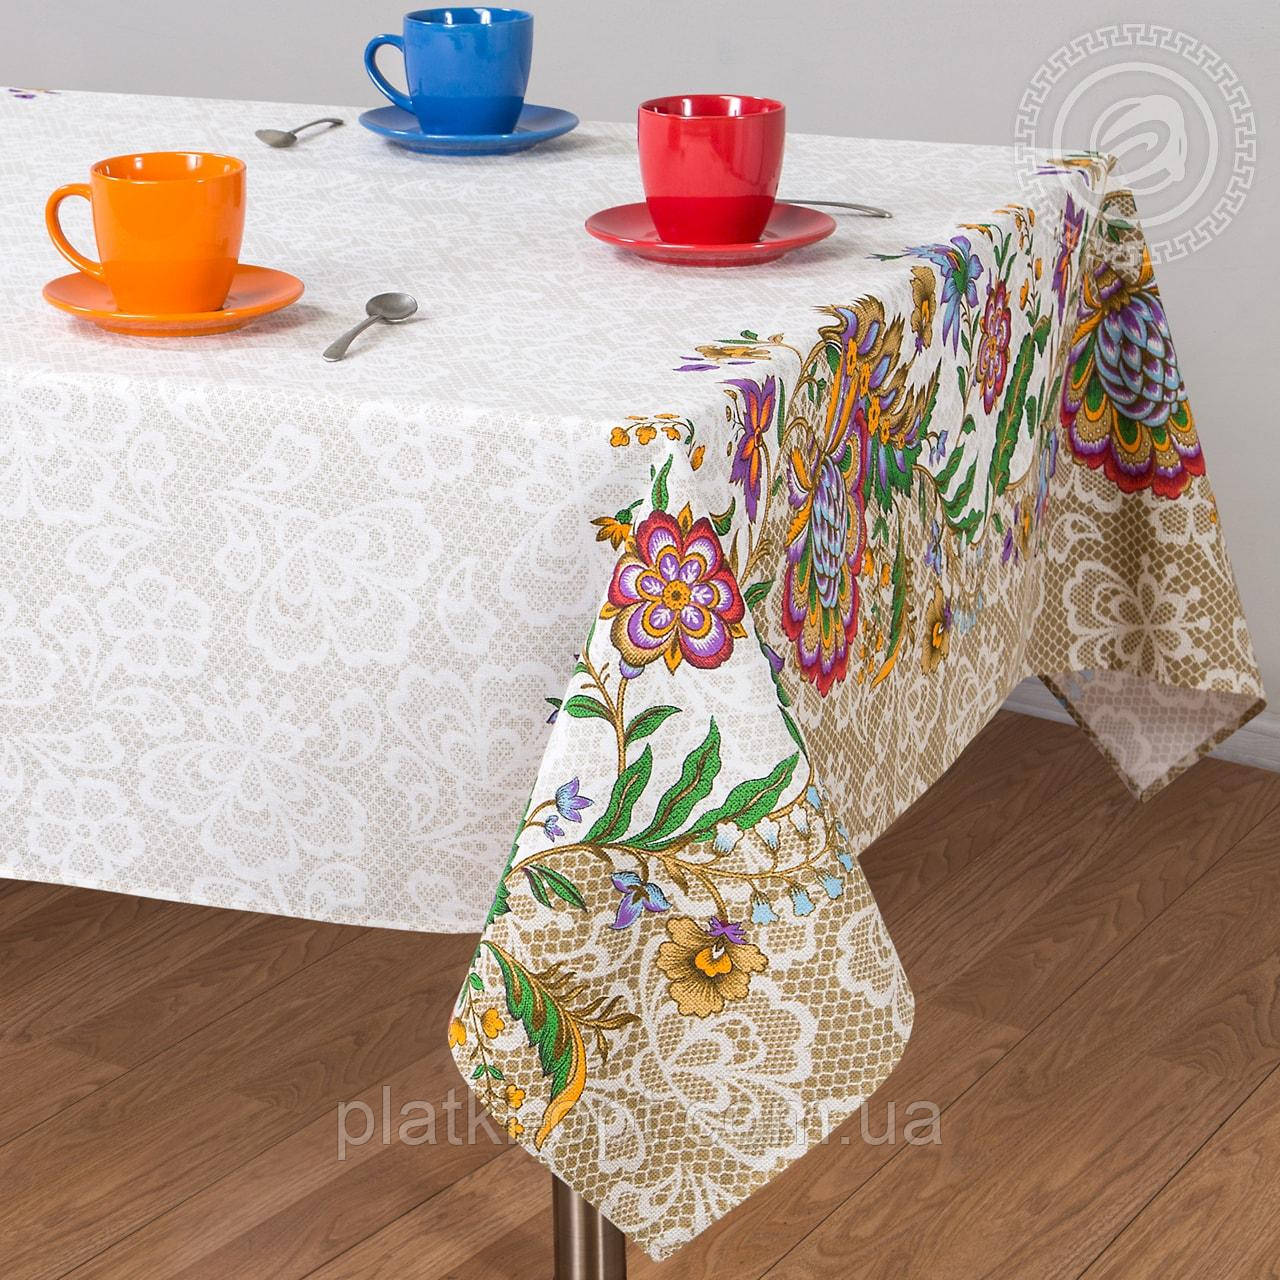 "Скатерть льняная  ""Барокко"" 1.8м х 1.5м (средний стол)"